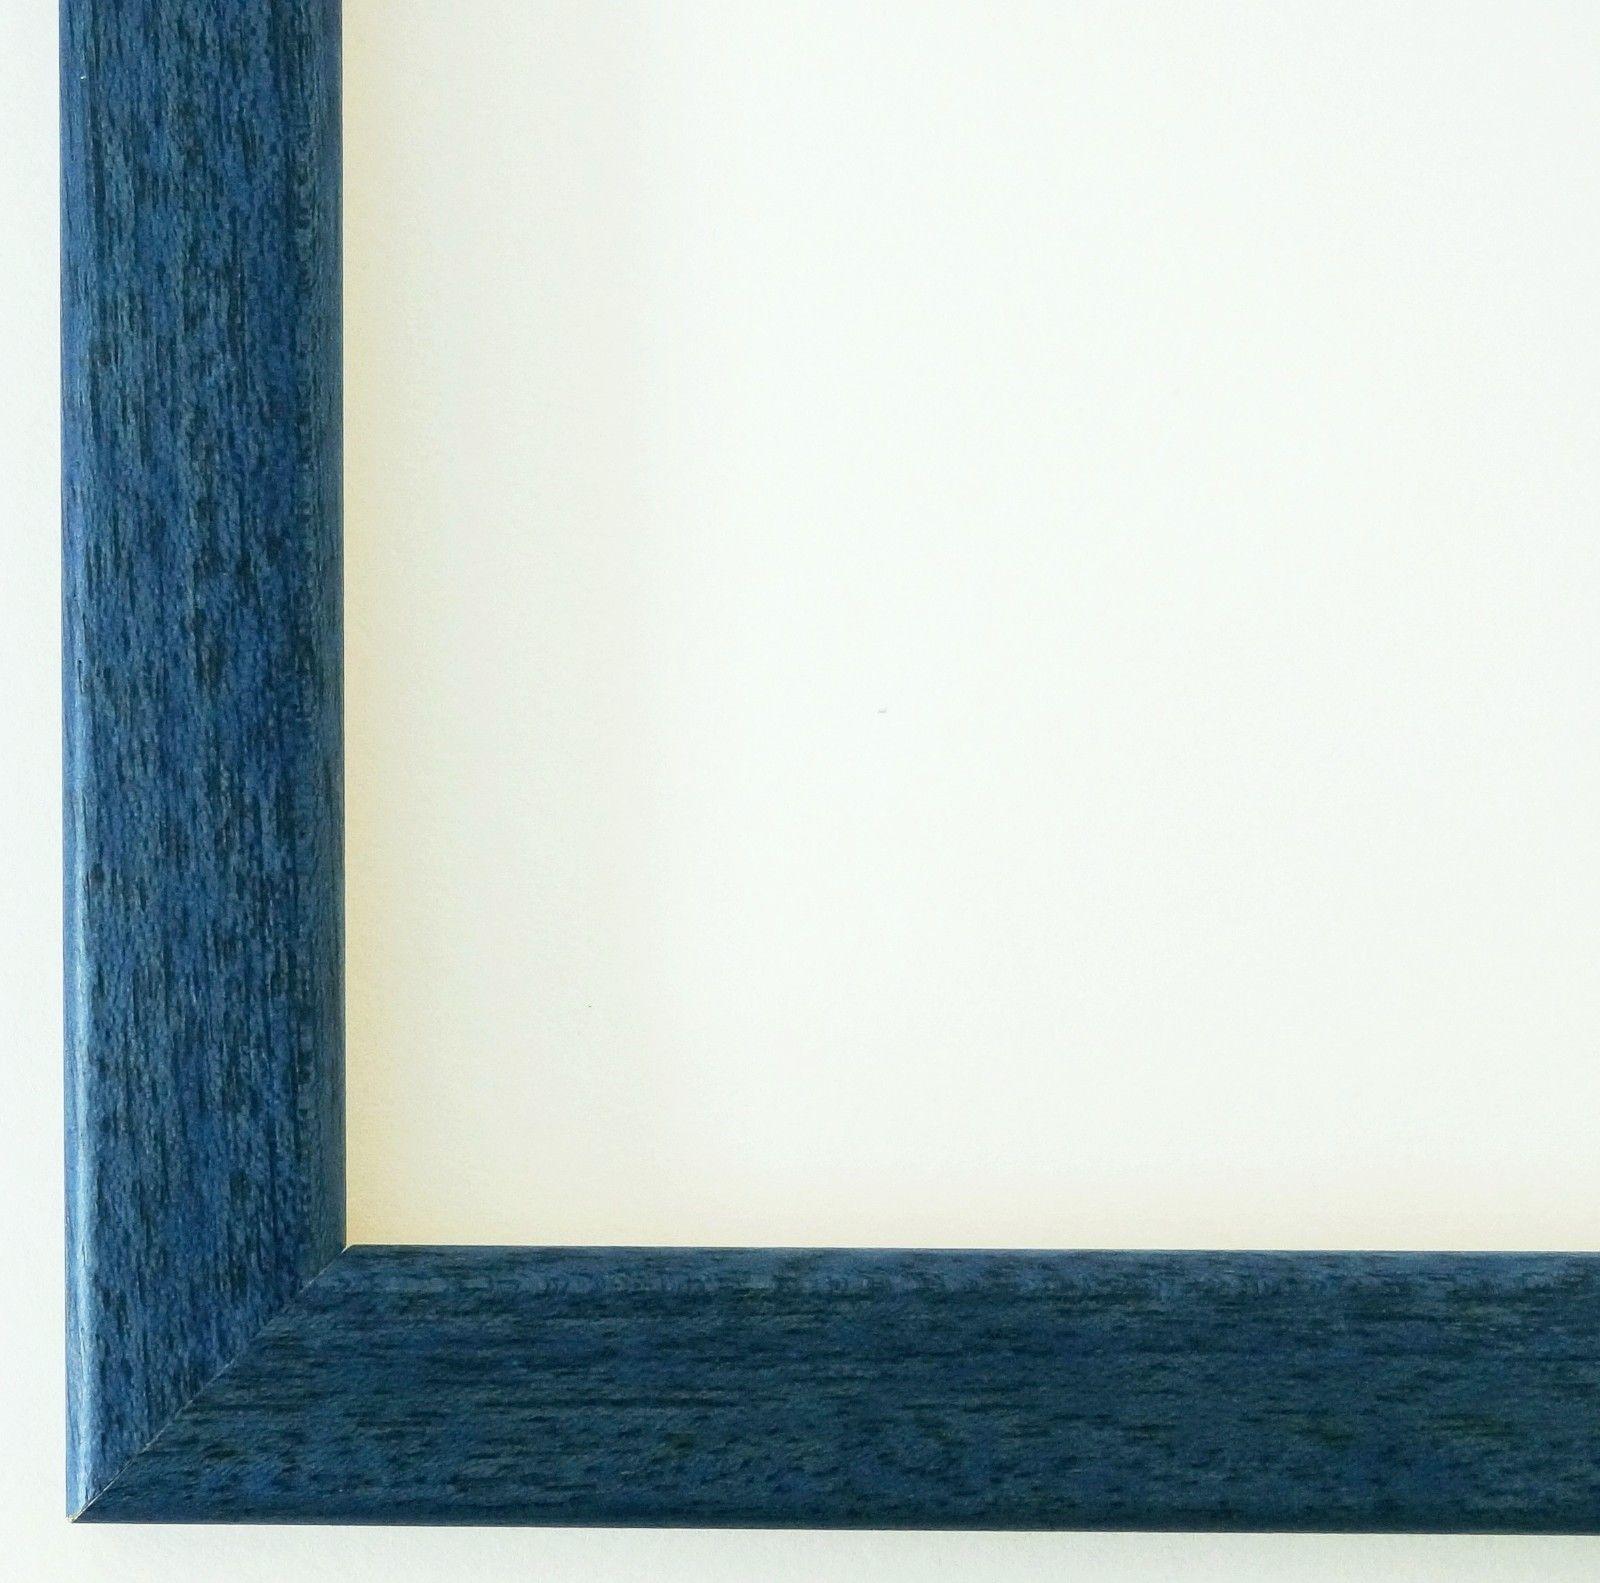 Bilderrahmen Blau Hannover 2, 4 - 9x13 10x10 10x15 13x18 15x20 18x24 ...